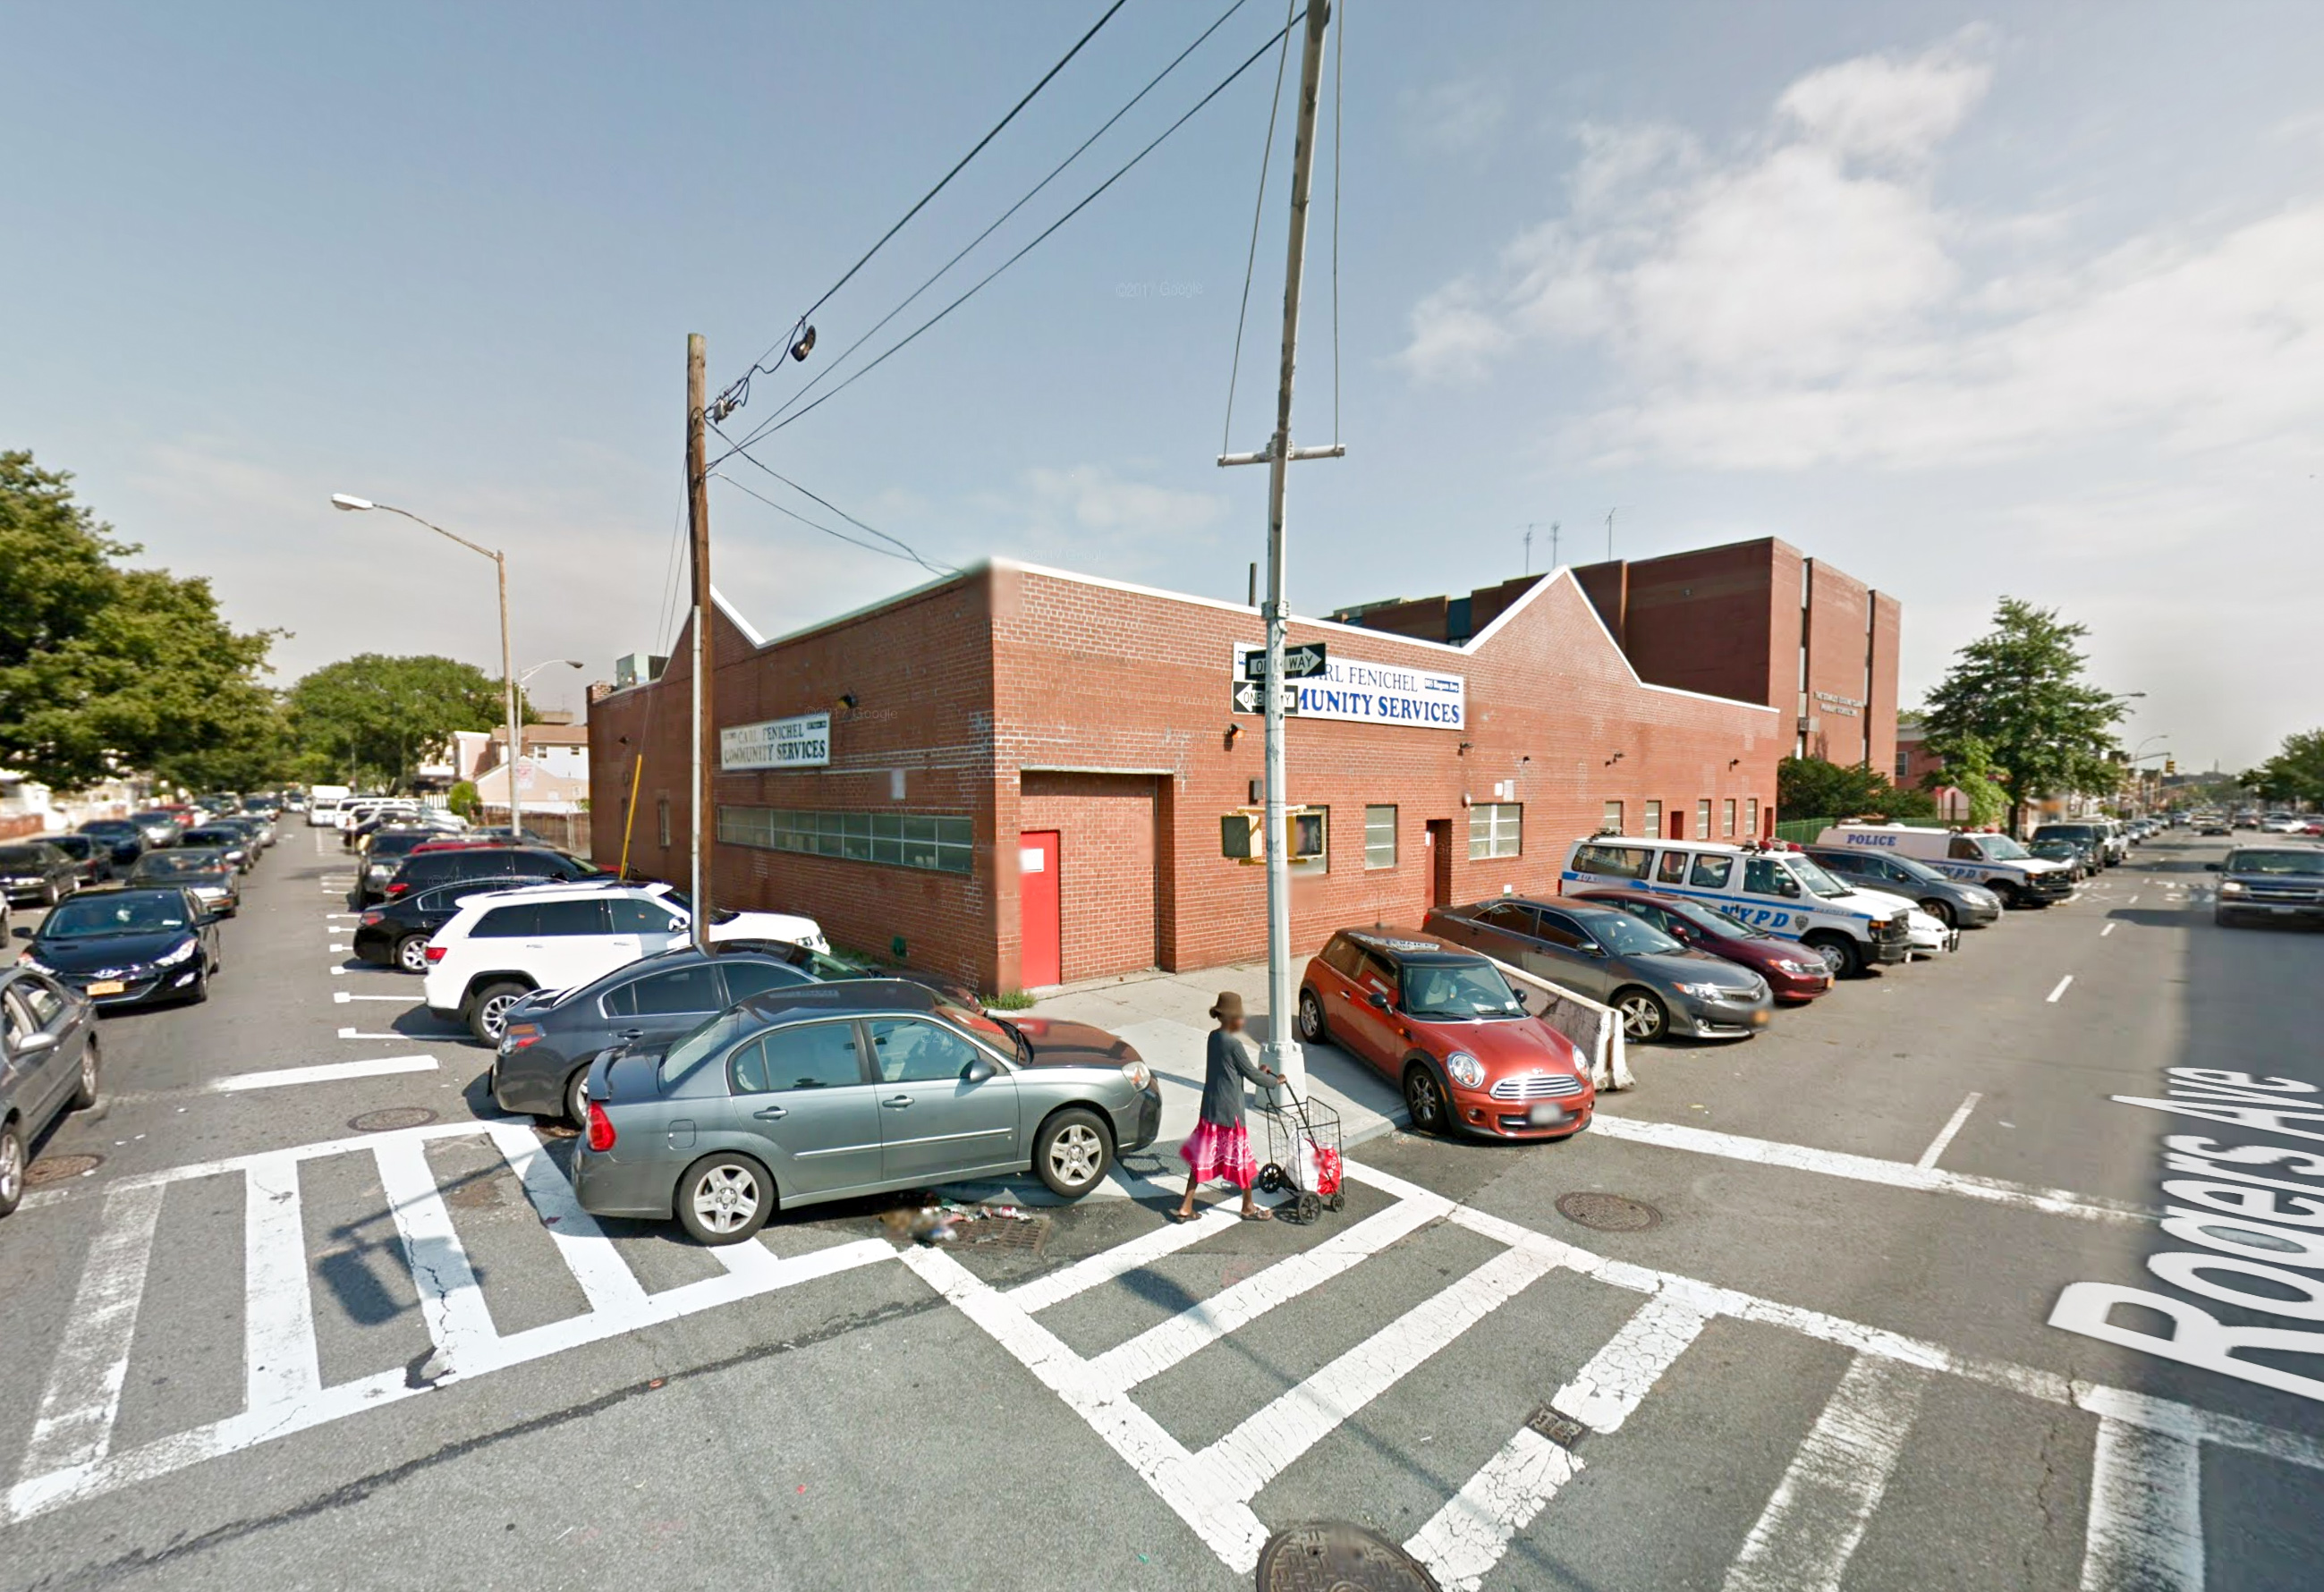 2708 Snyder Avenue, via Google Maps